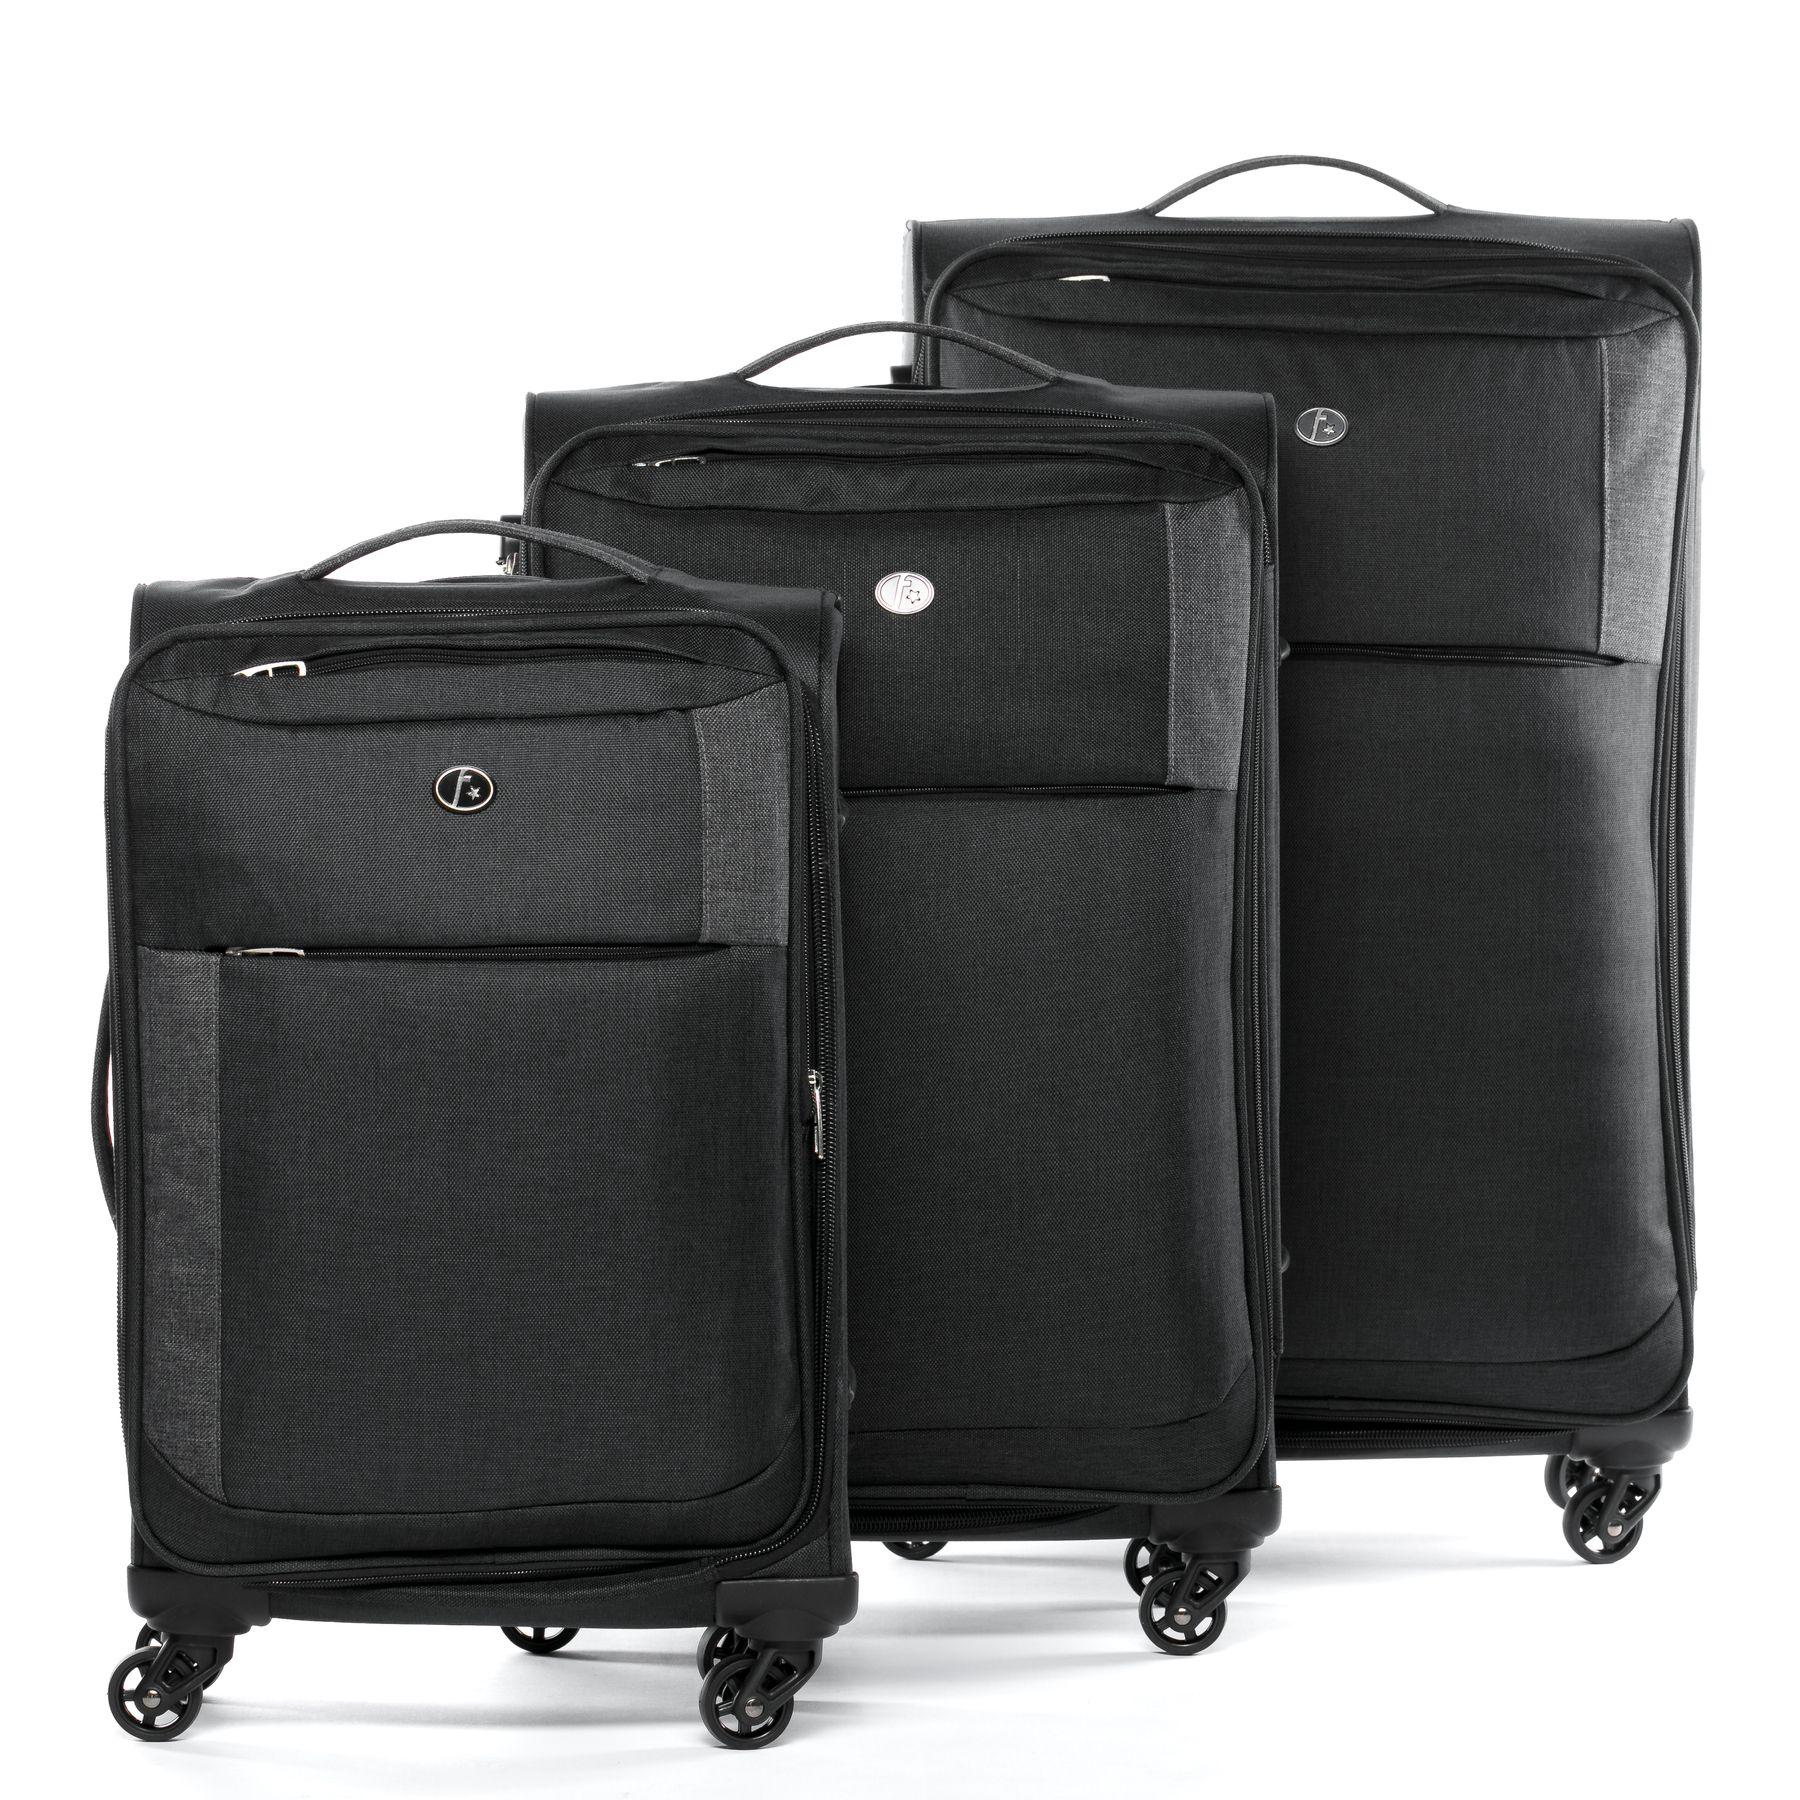 ferg 3er kofferset weichschale trolley stoffkoffer 3 tlg. Black Bedroom Furniture Sets. Home Design Ideas